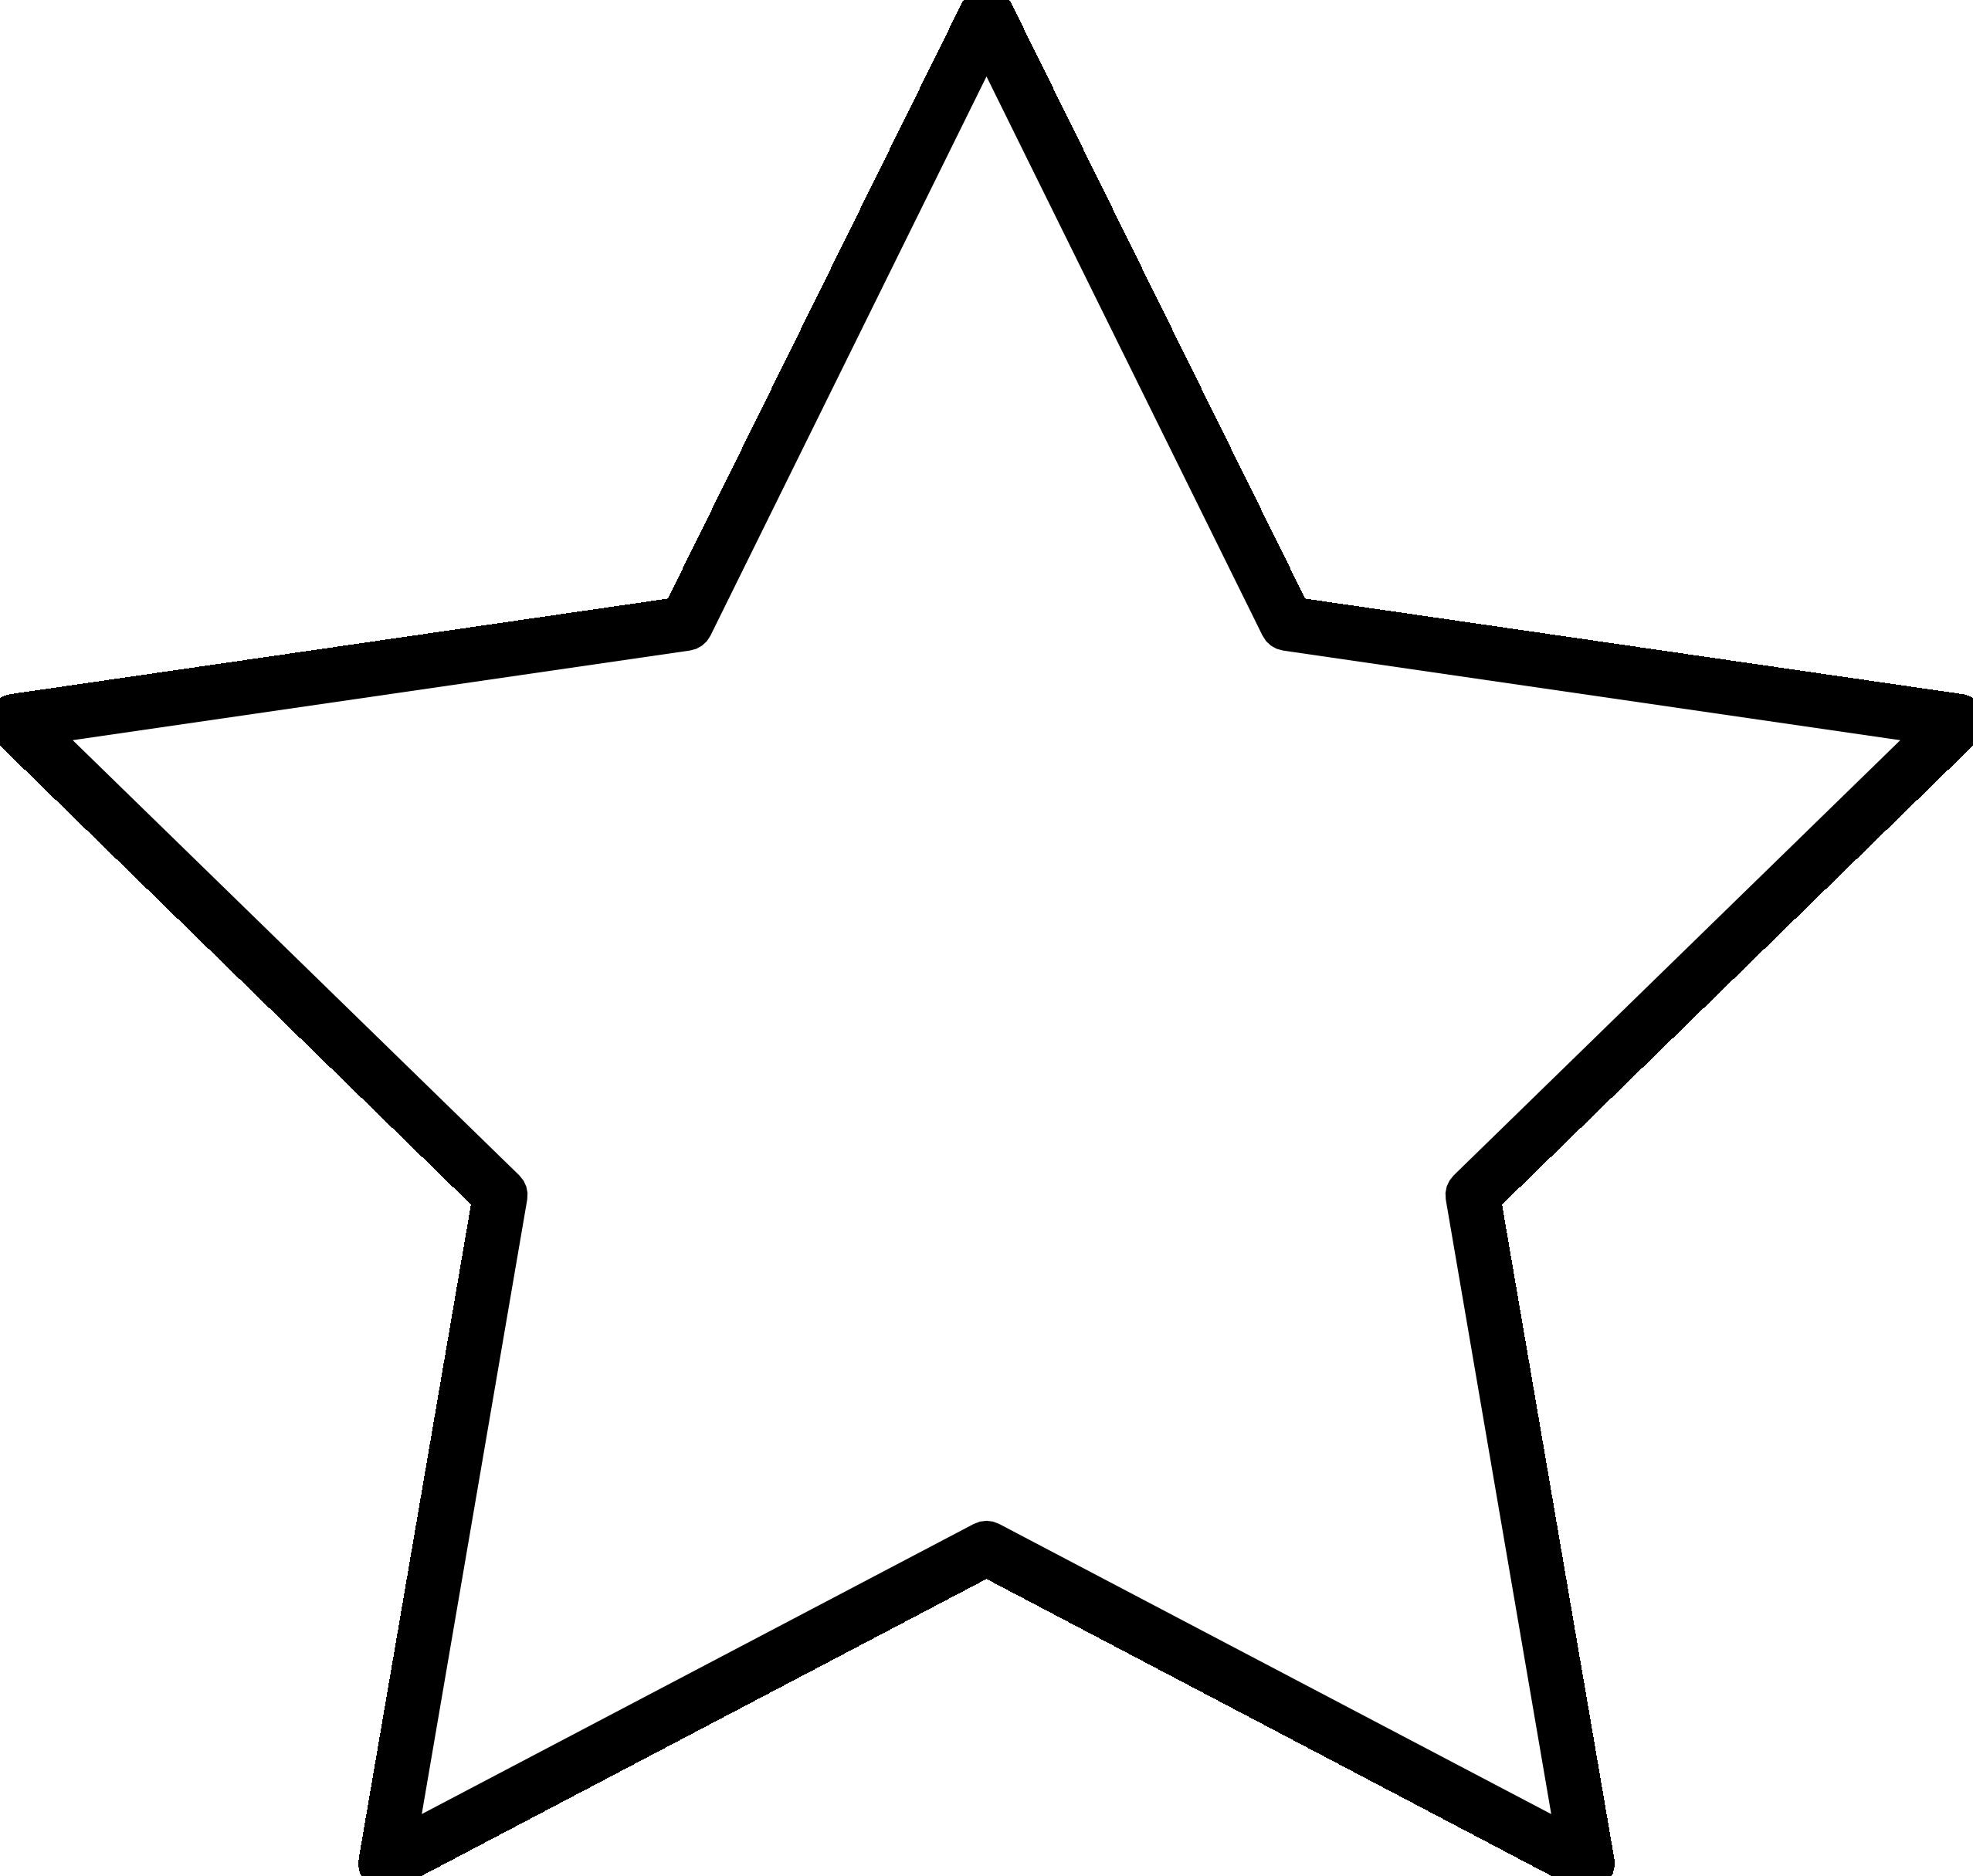 Star silhouette Outline Clip Art.